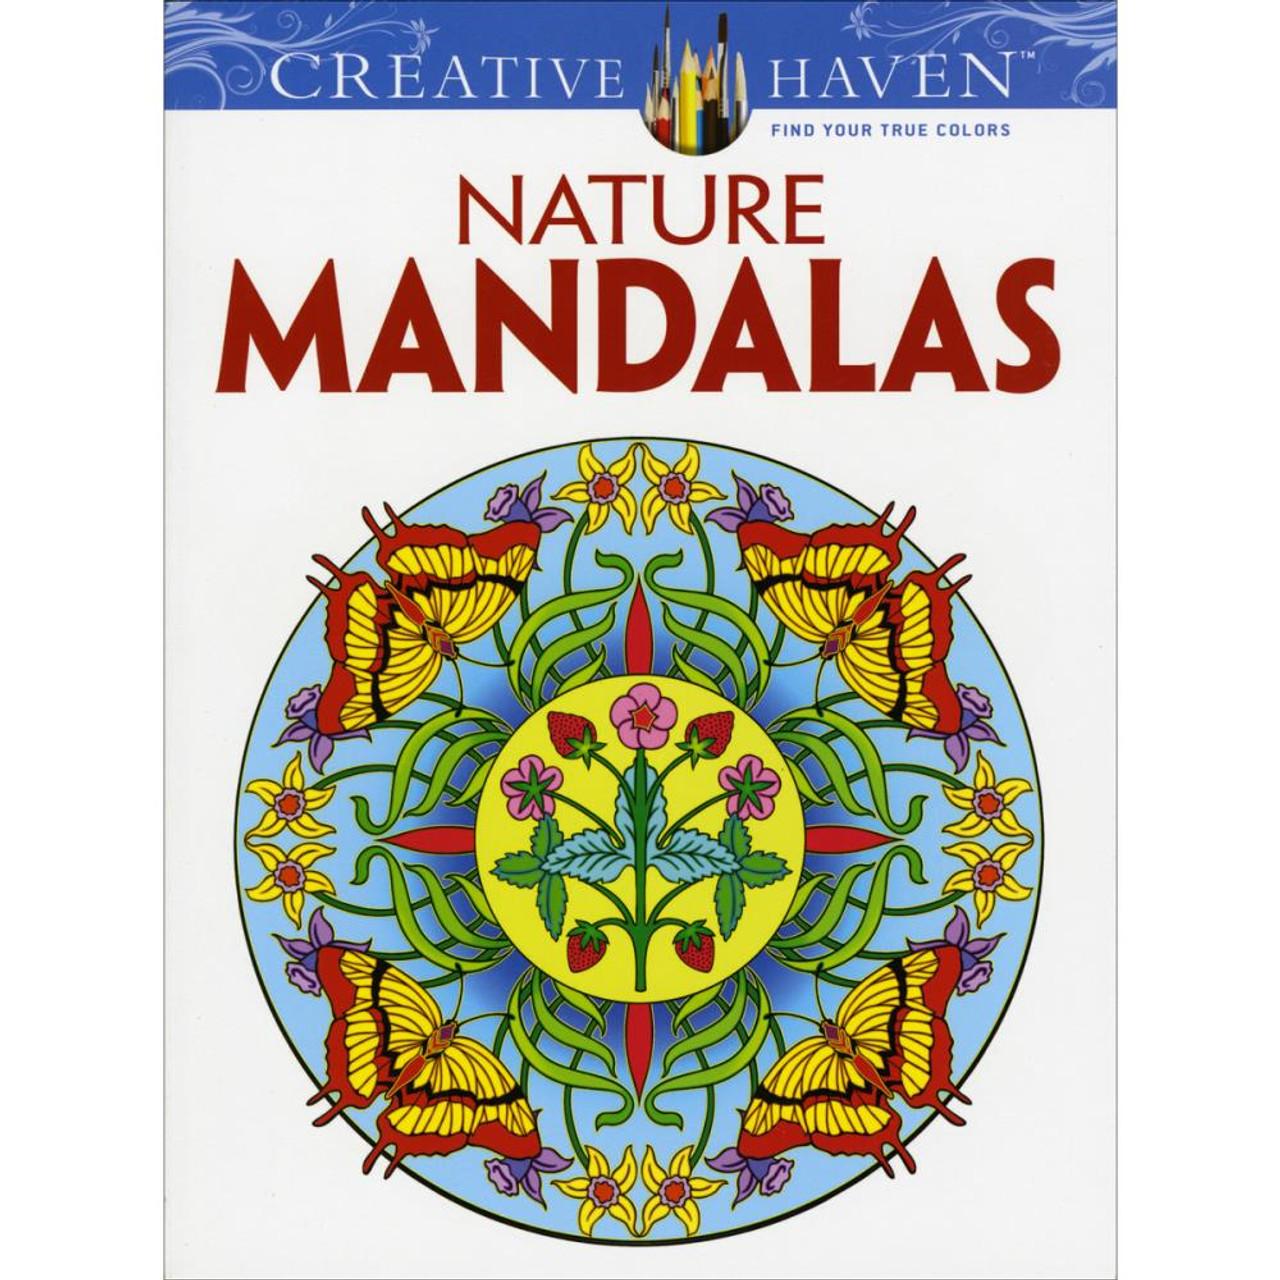 Creative Haven Coloring Book Nature Mandalas